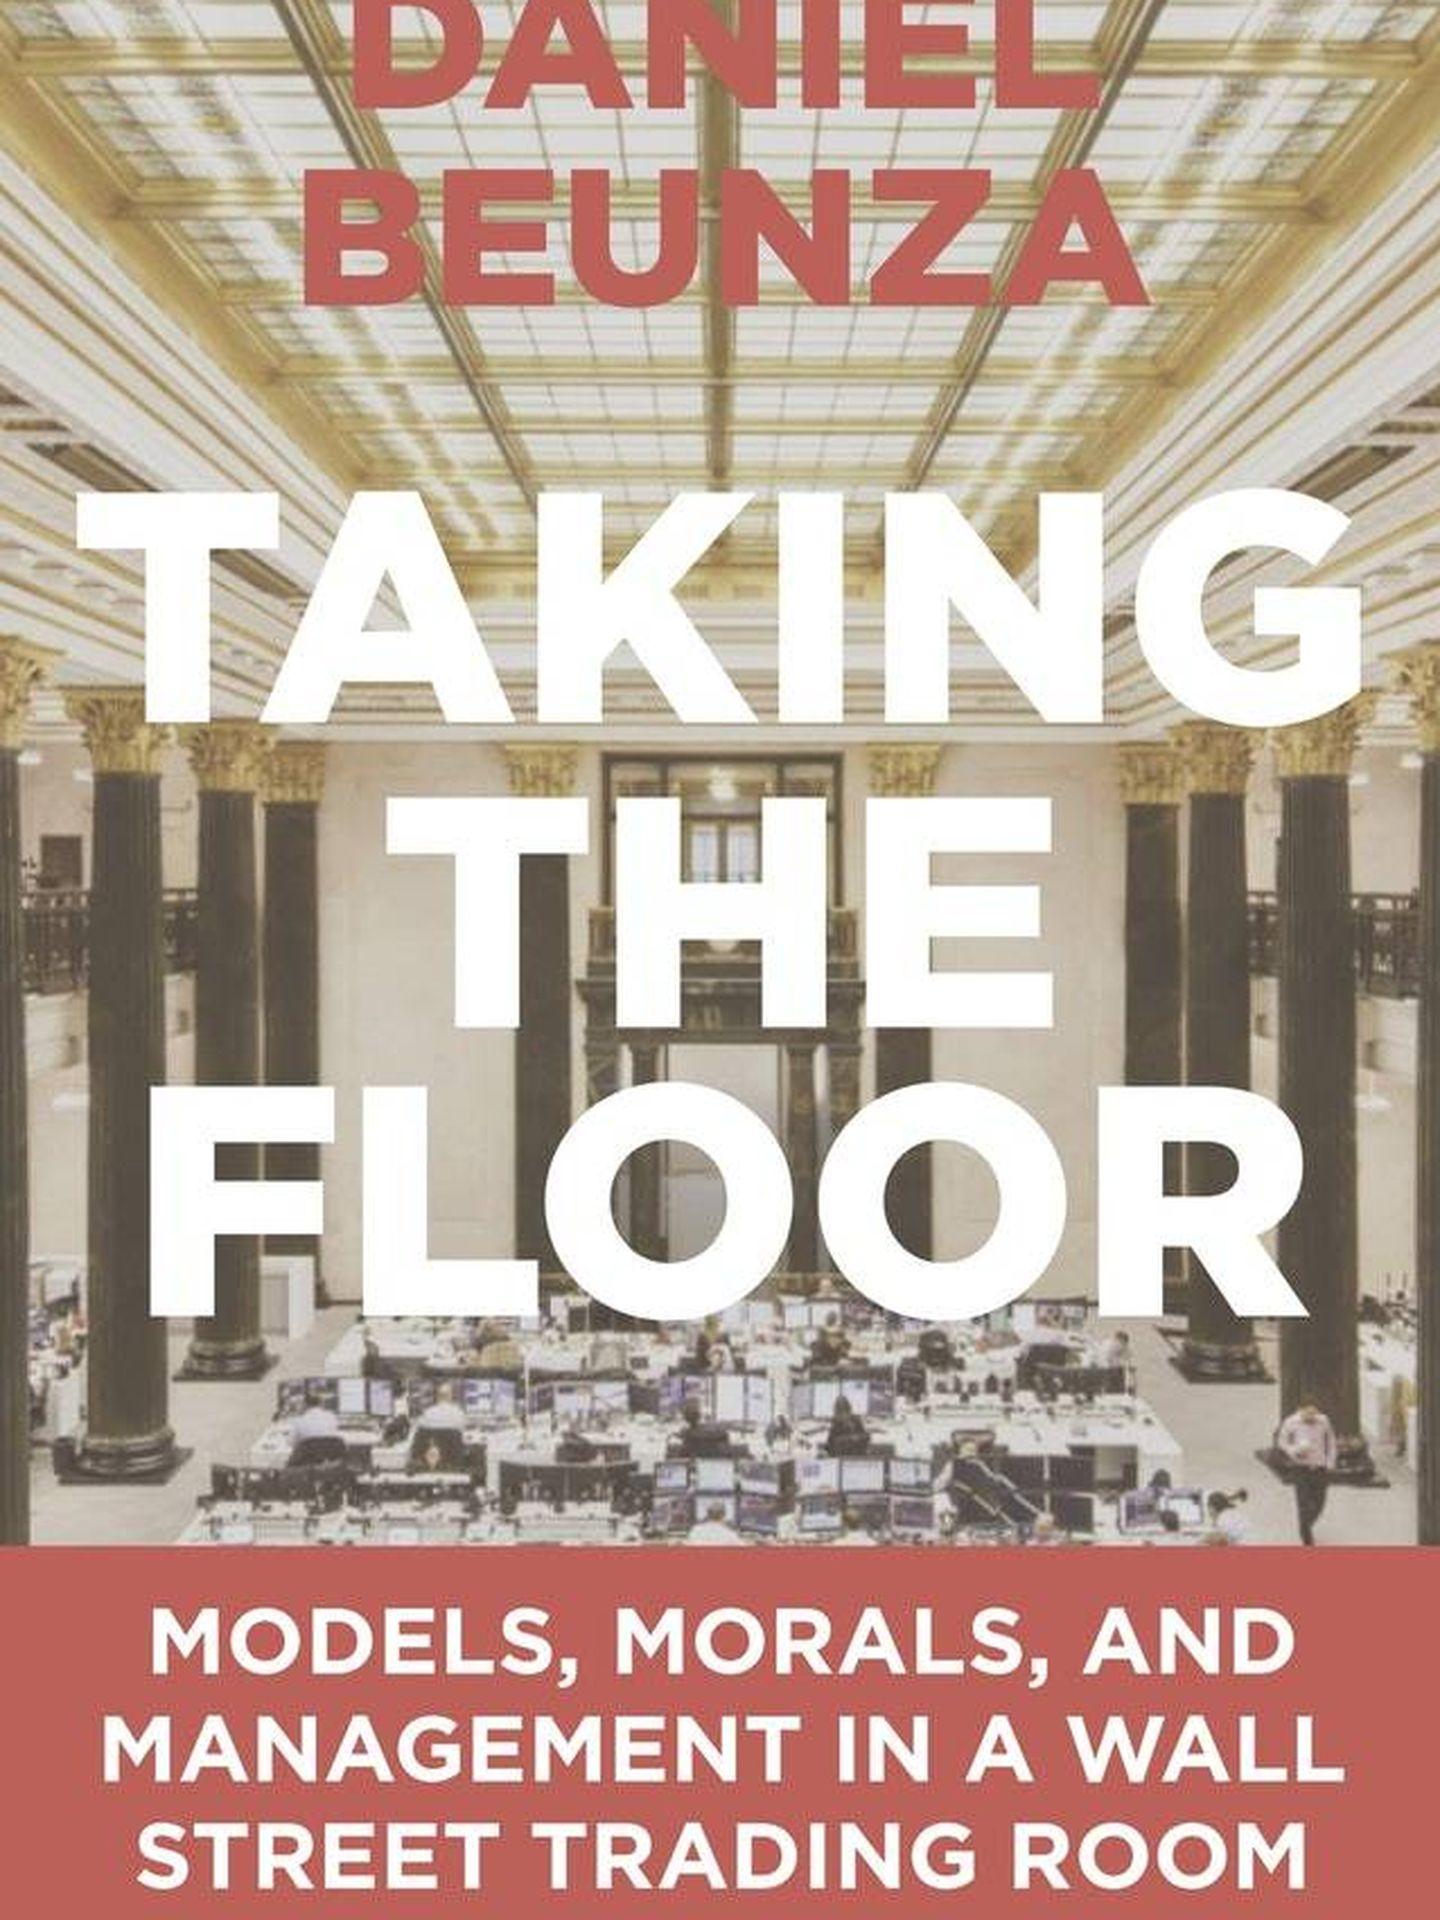 Portada del último libro de Daniel Beunza